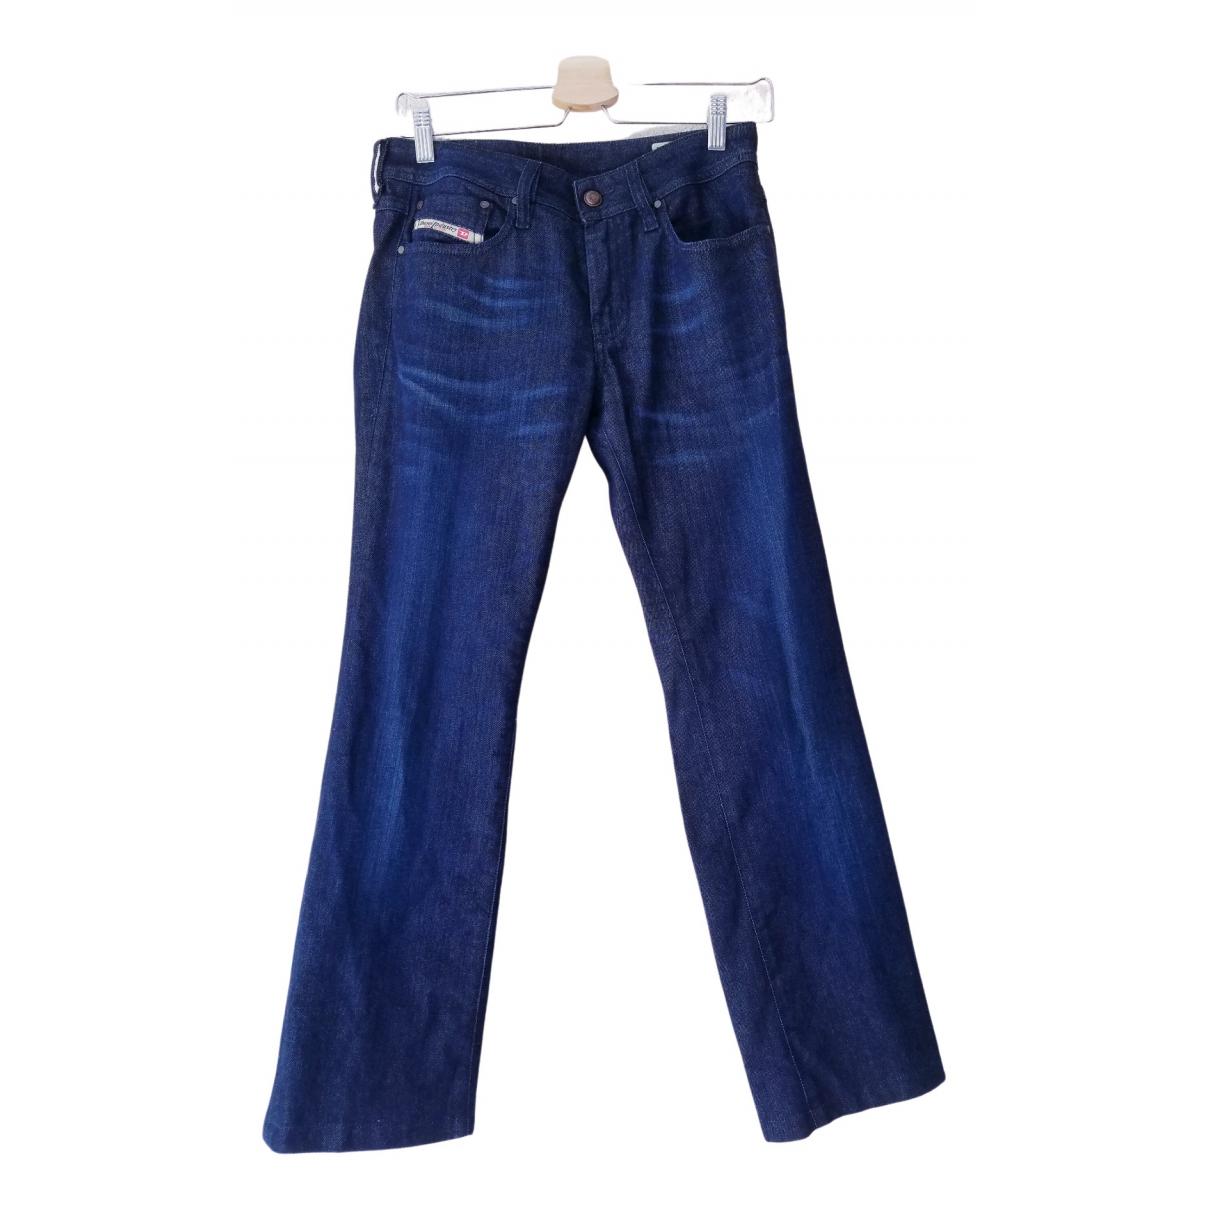 Diesel \N Navy Cotton - elasthane Jeans for Women 28 US